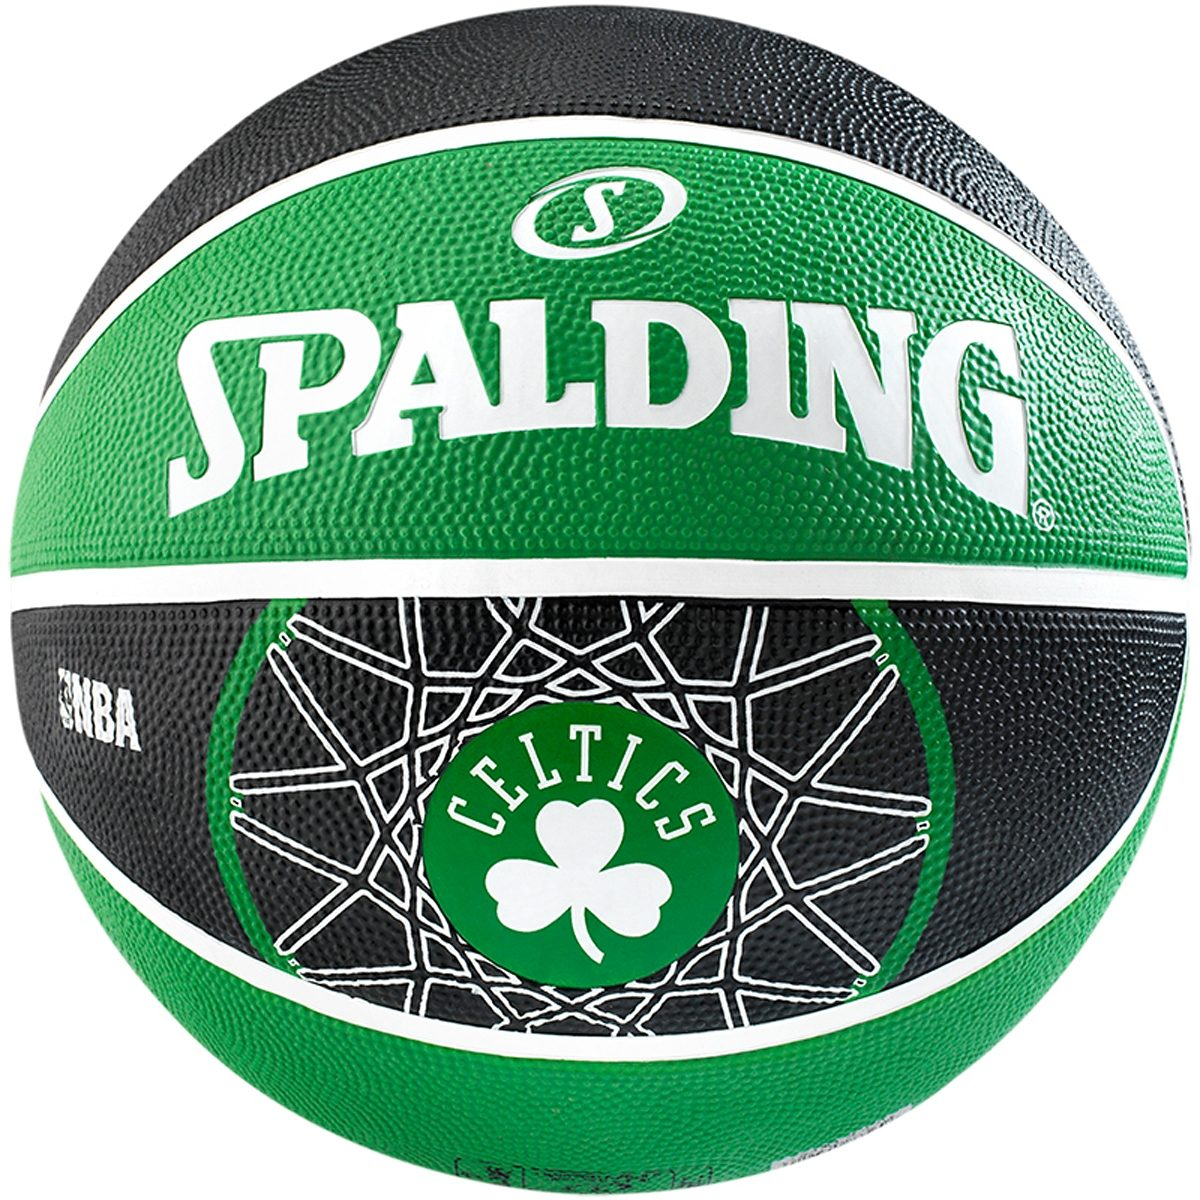 SPALDING Team Boston Celtics Basketball